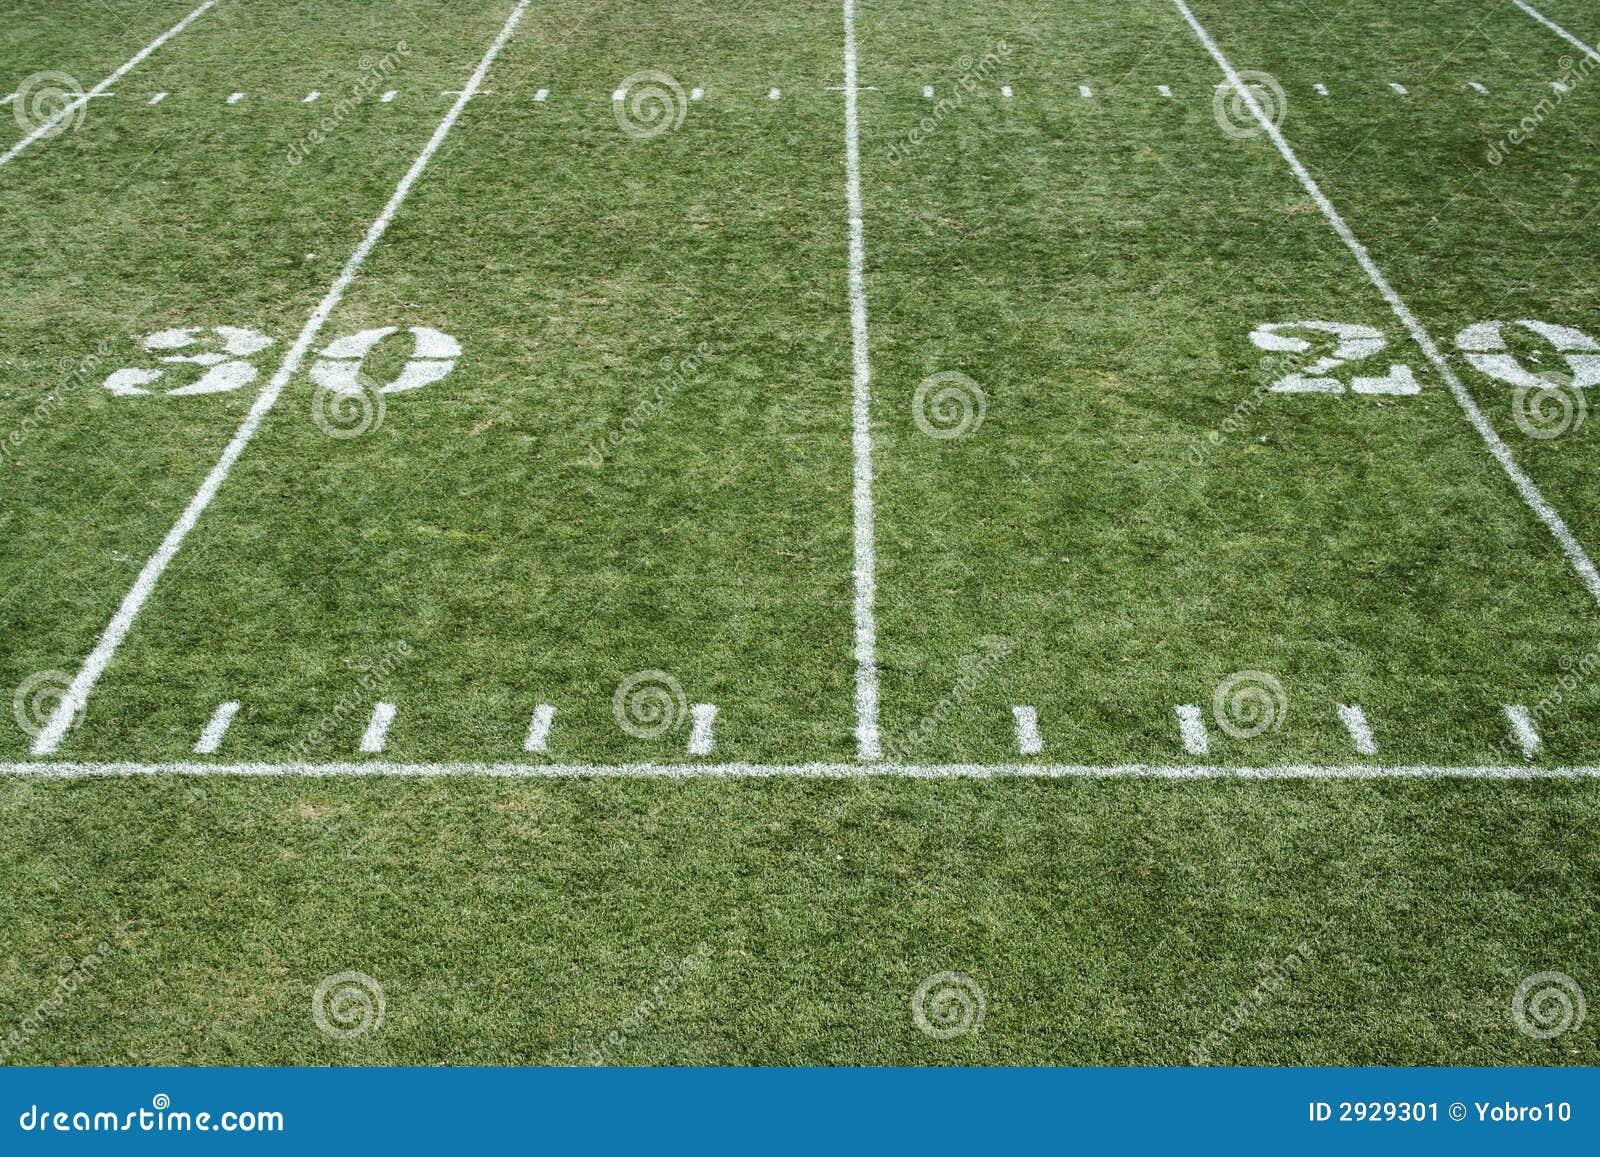 Football Field Grass Stock Image Image Of Tradition Yardage 2929301